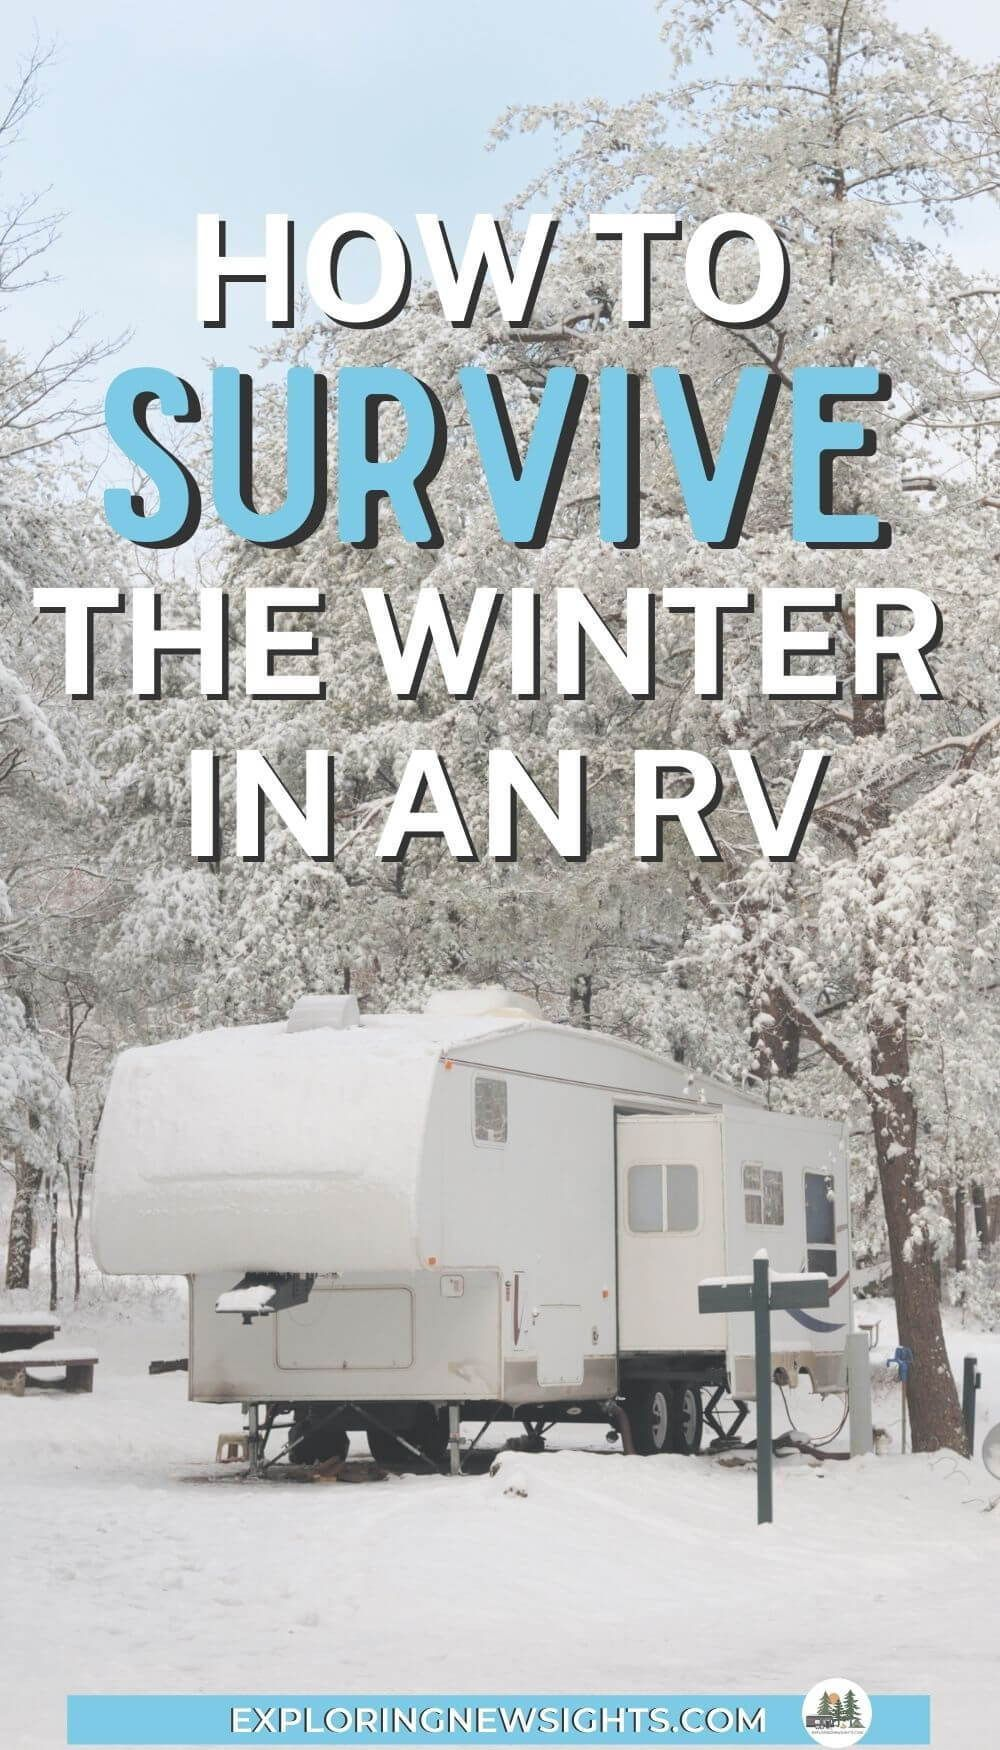 Winter Rv Living Survive An Overnight Freeze In An Rv Camping Rv Living Rv Living Full Time Rv Living